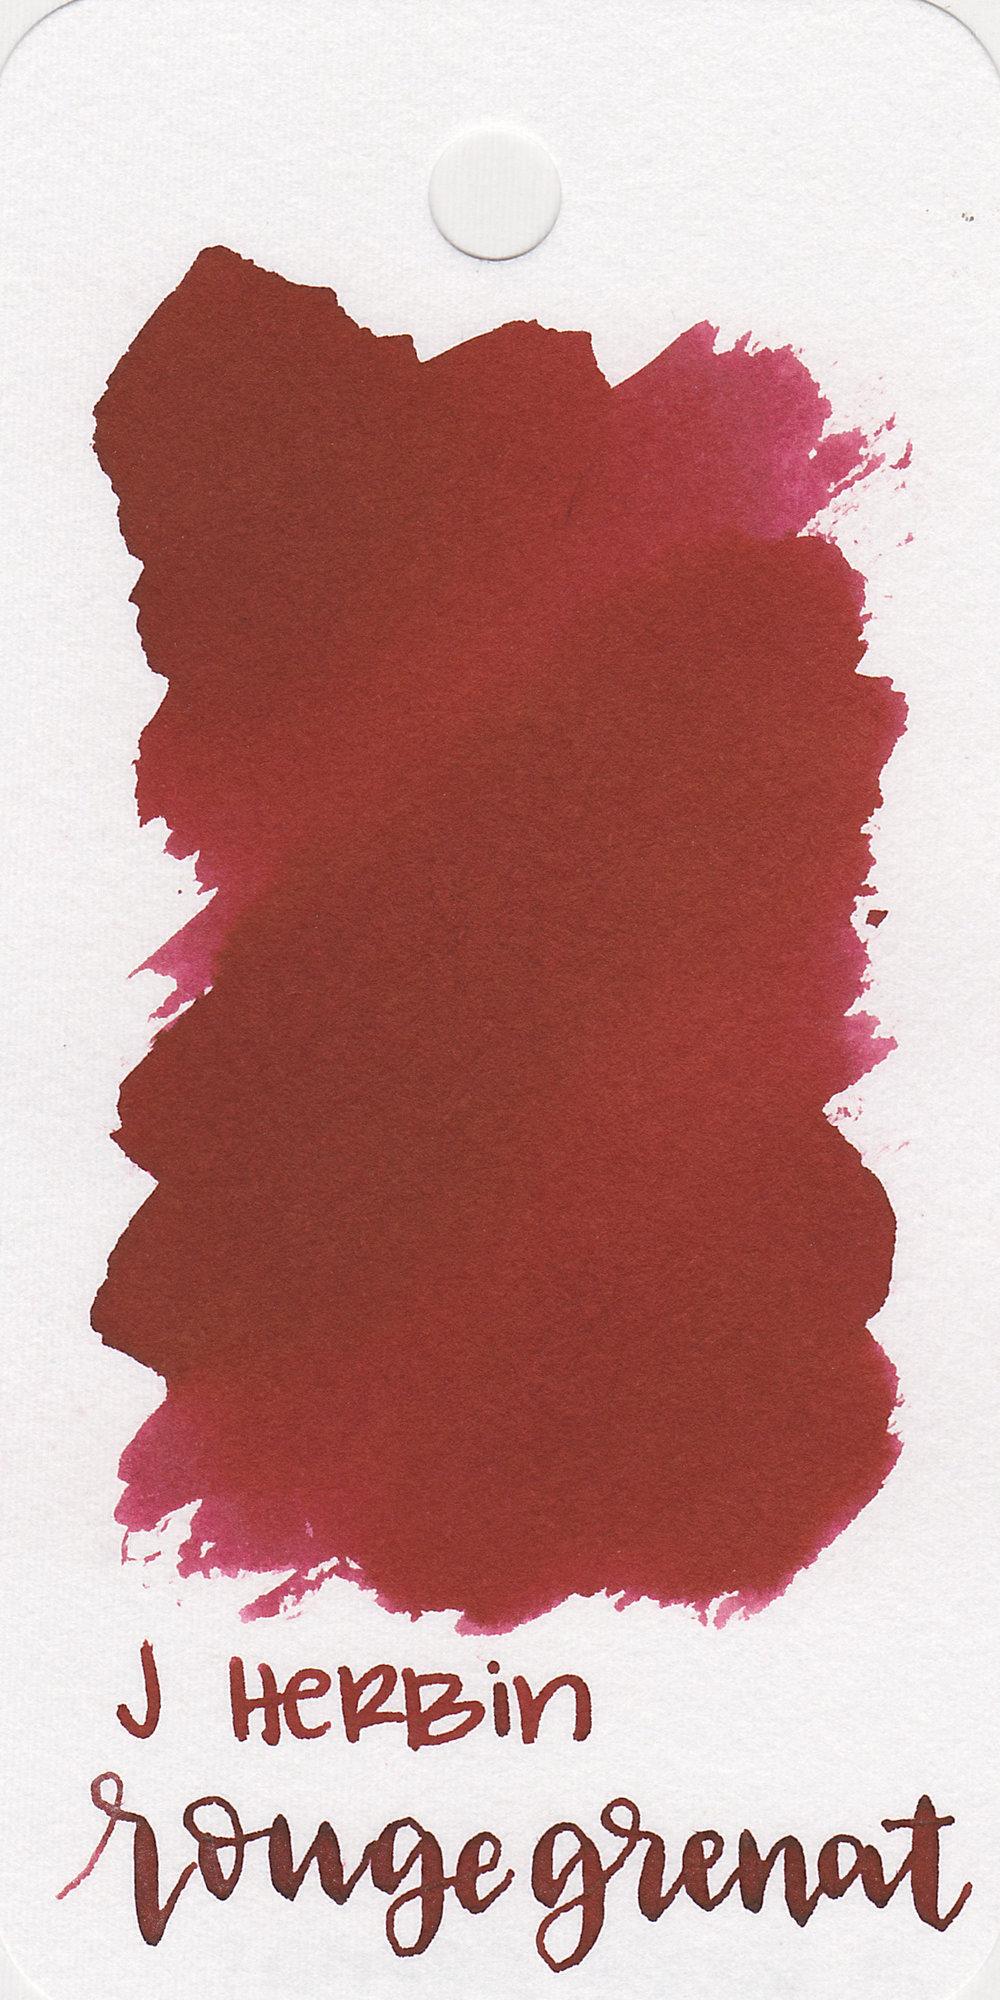 jh-rouge-grenat-1.jpg